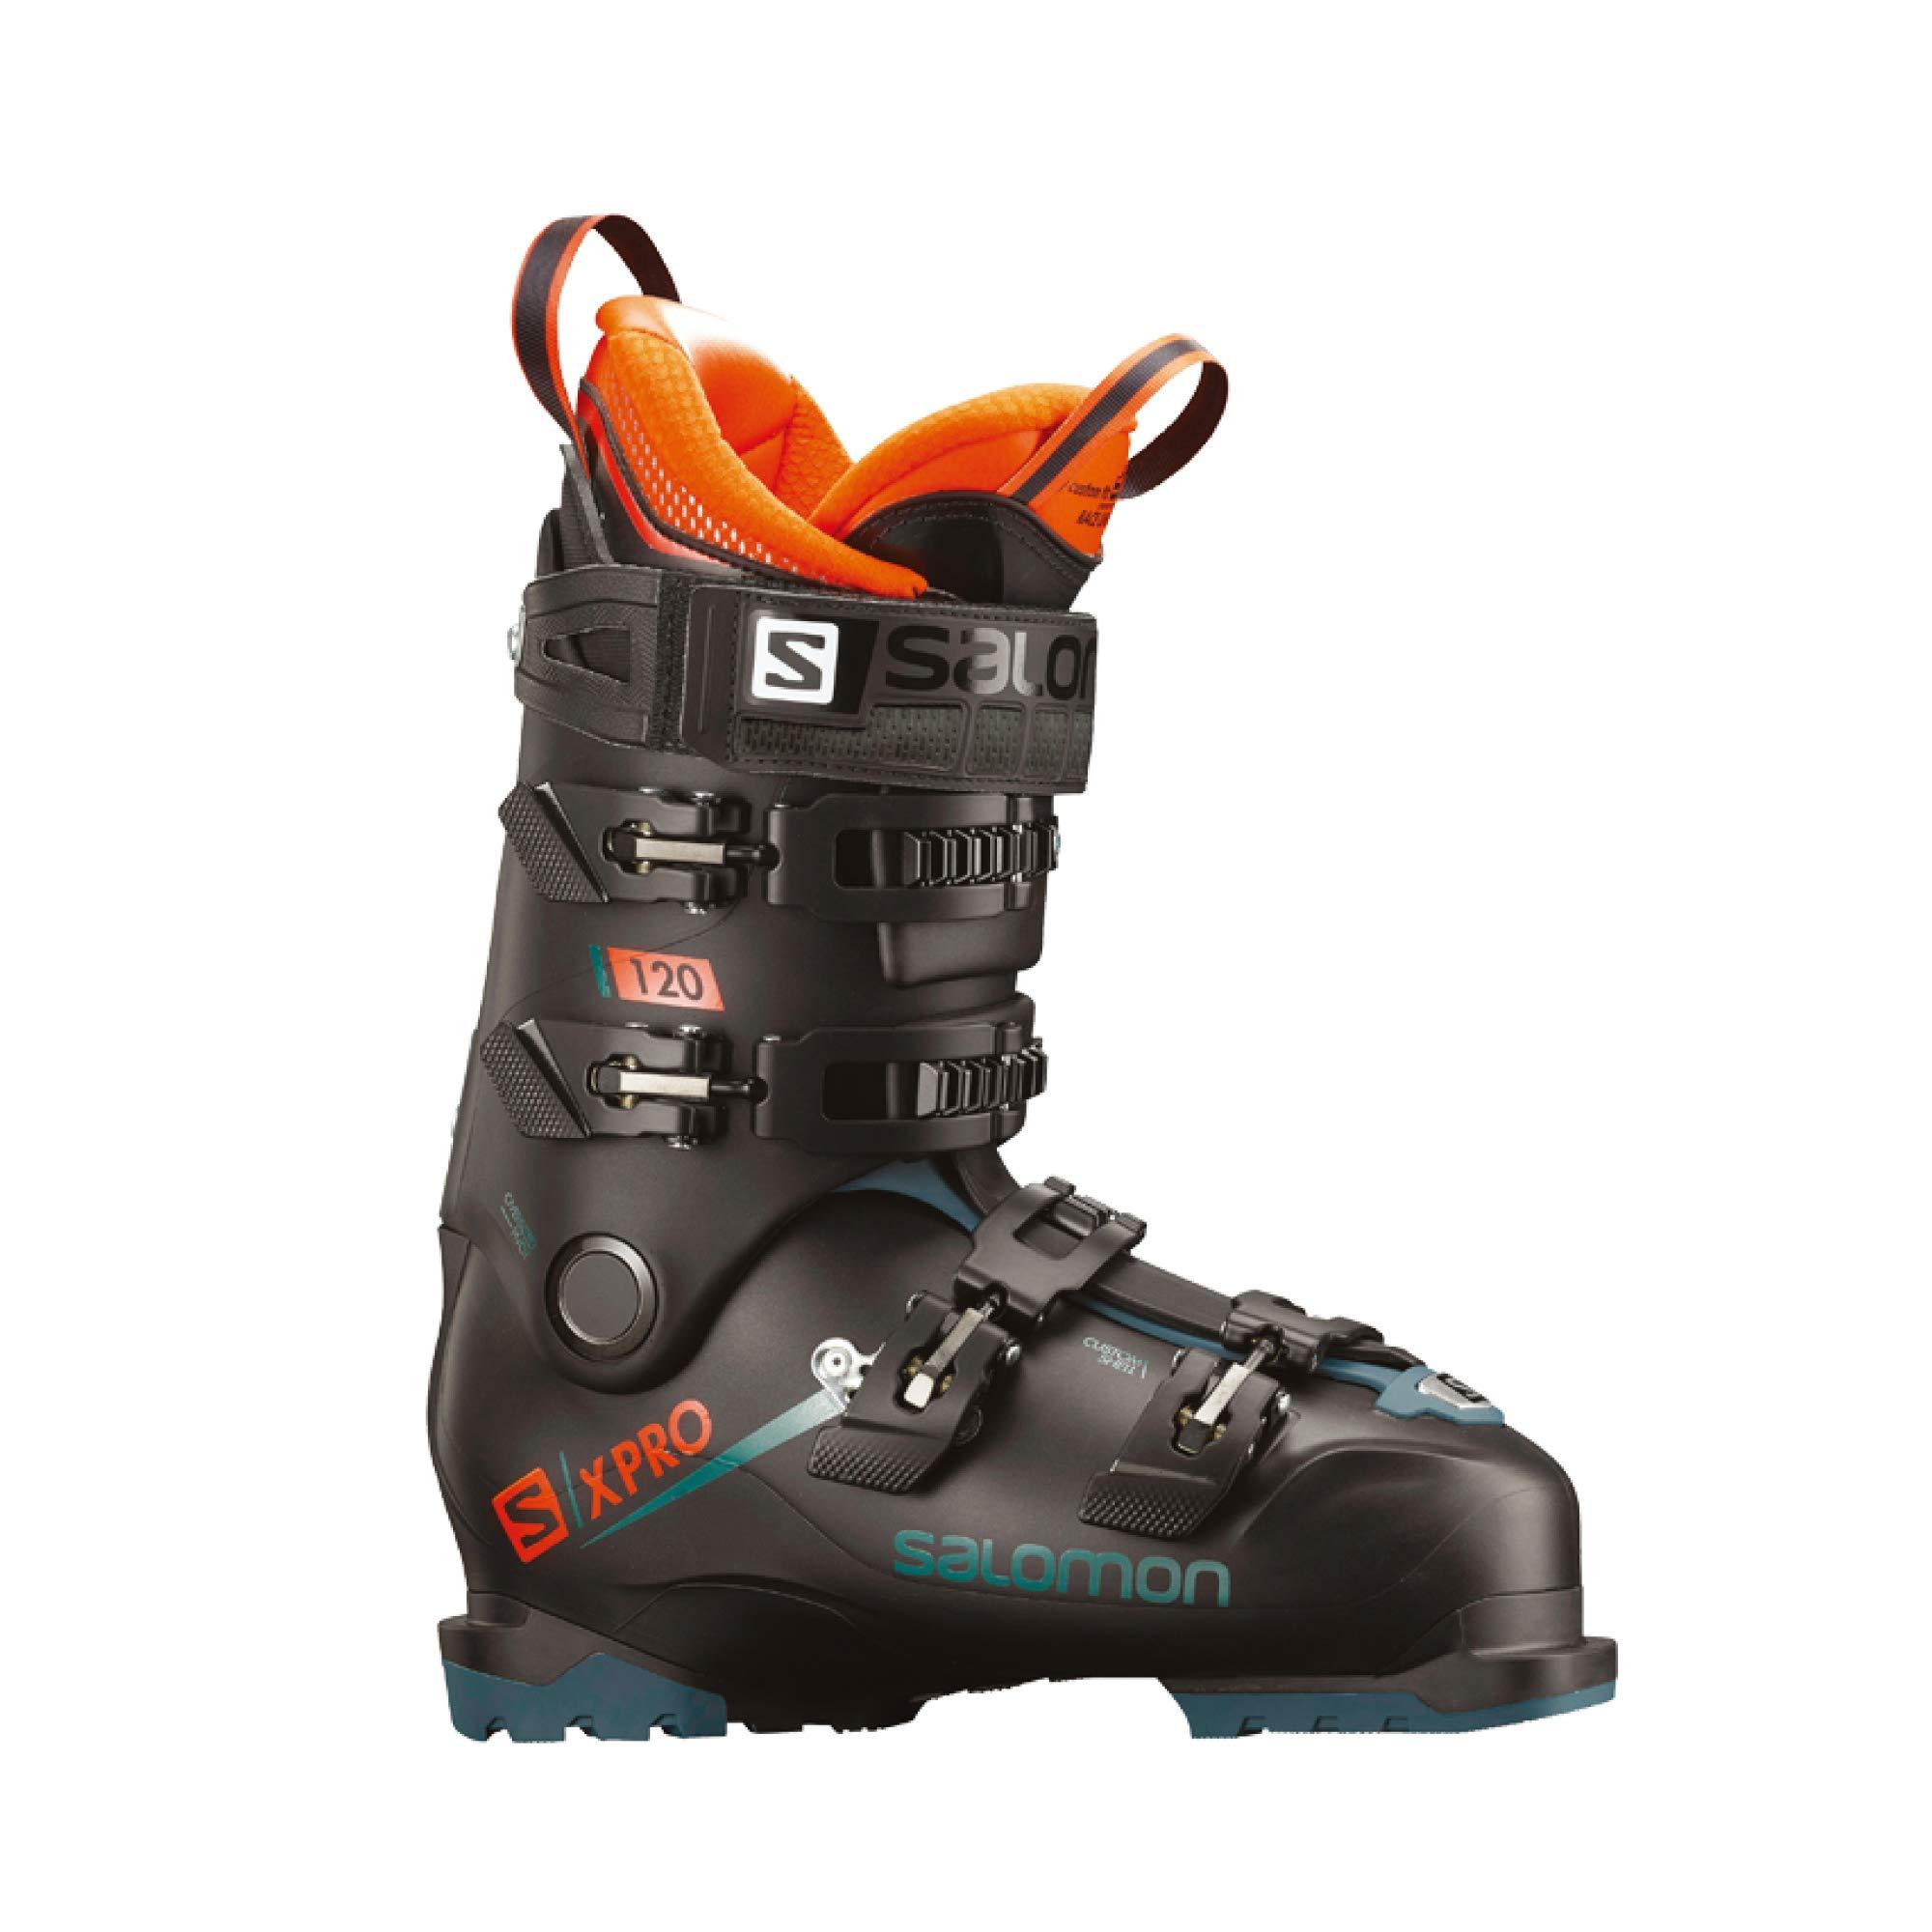 Salomon X Pro 120 Ski Boots Mens Sz 8/8